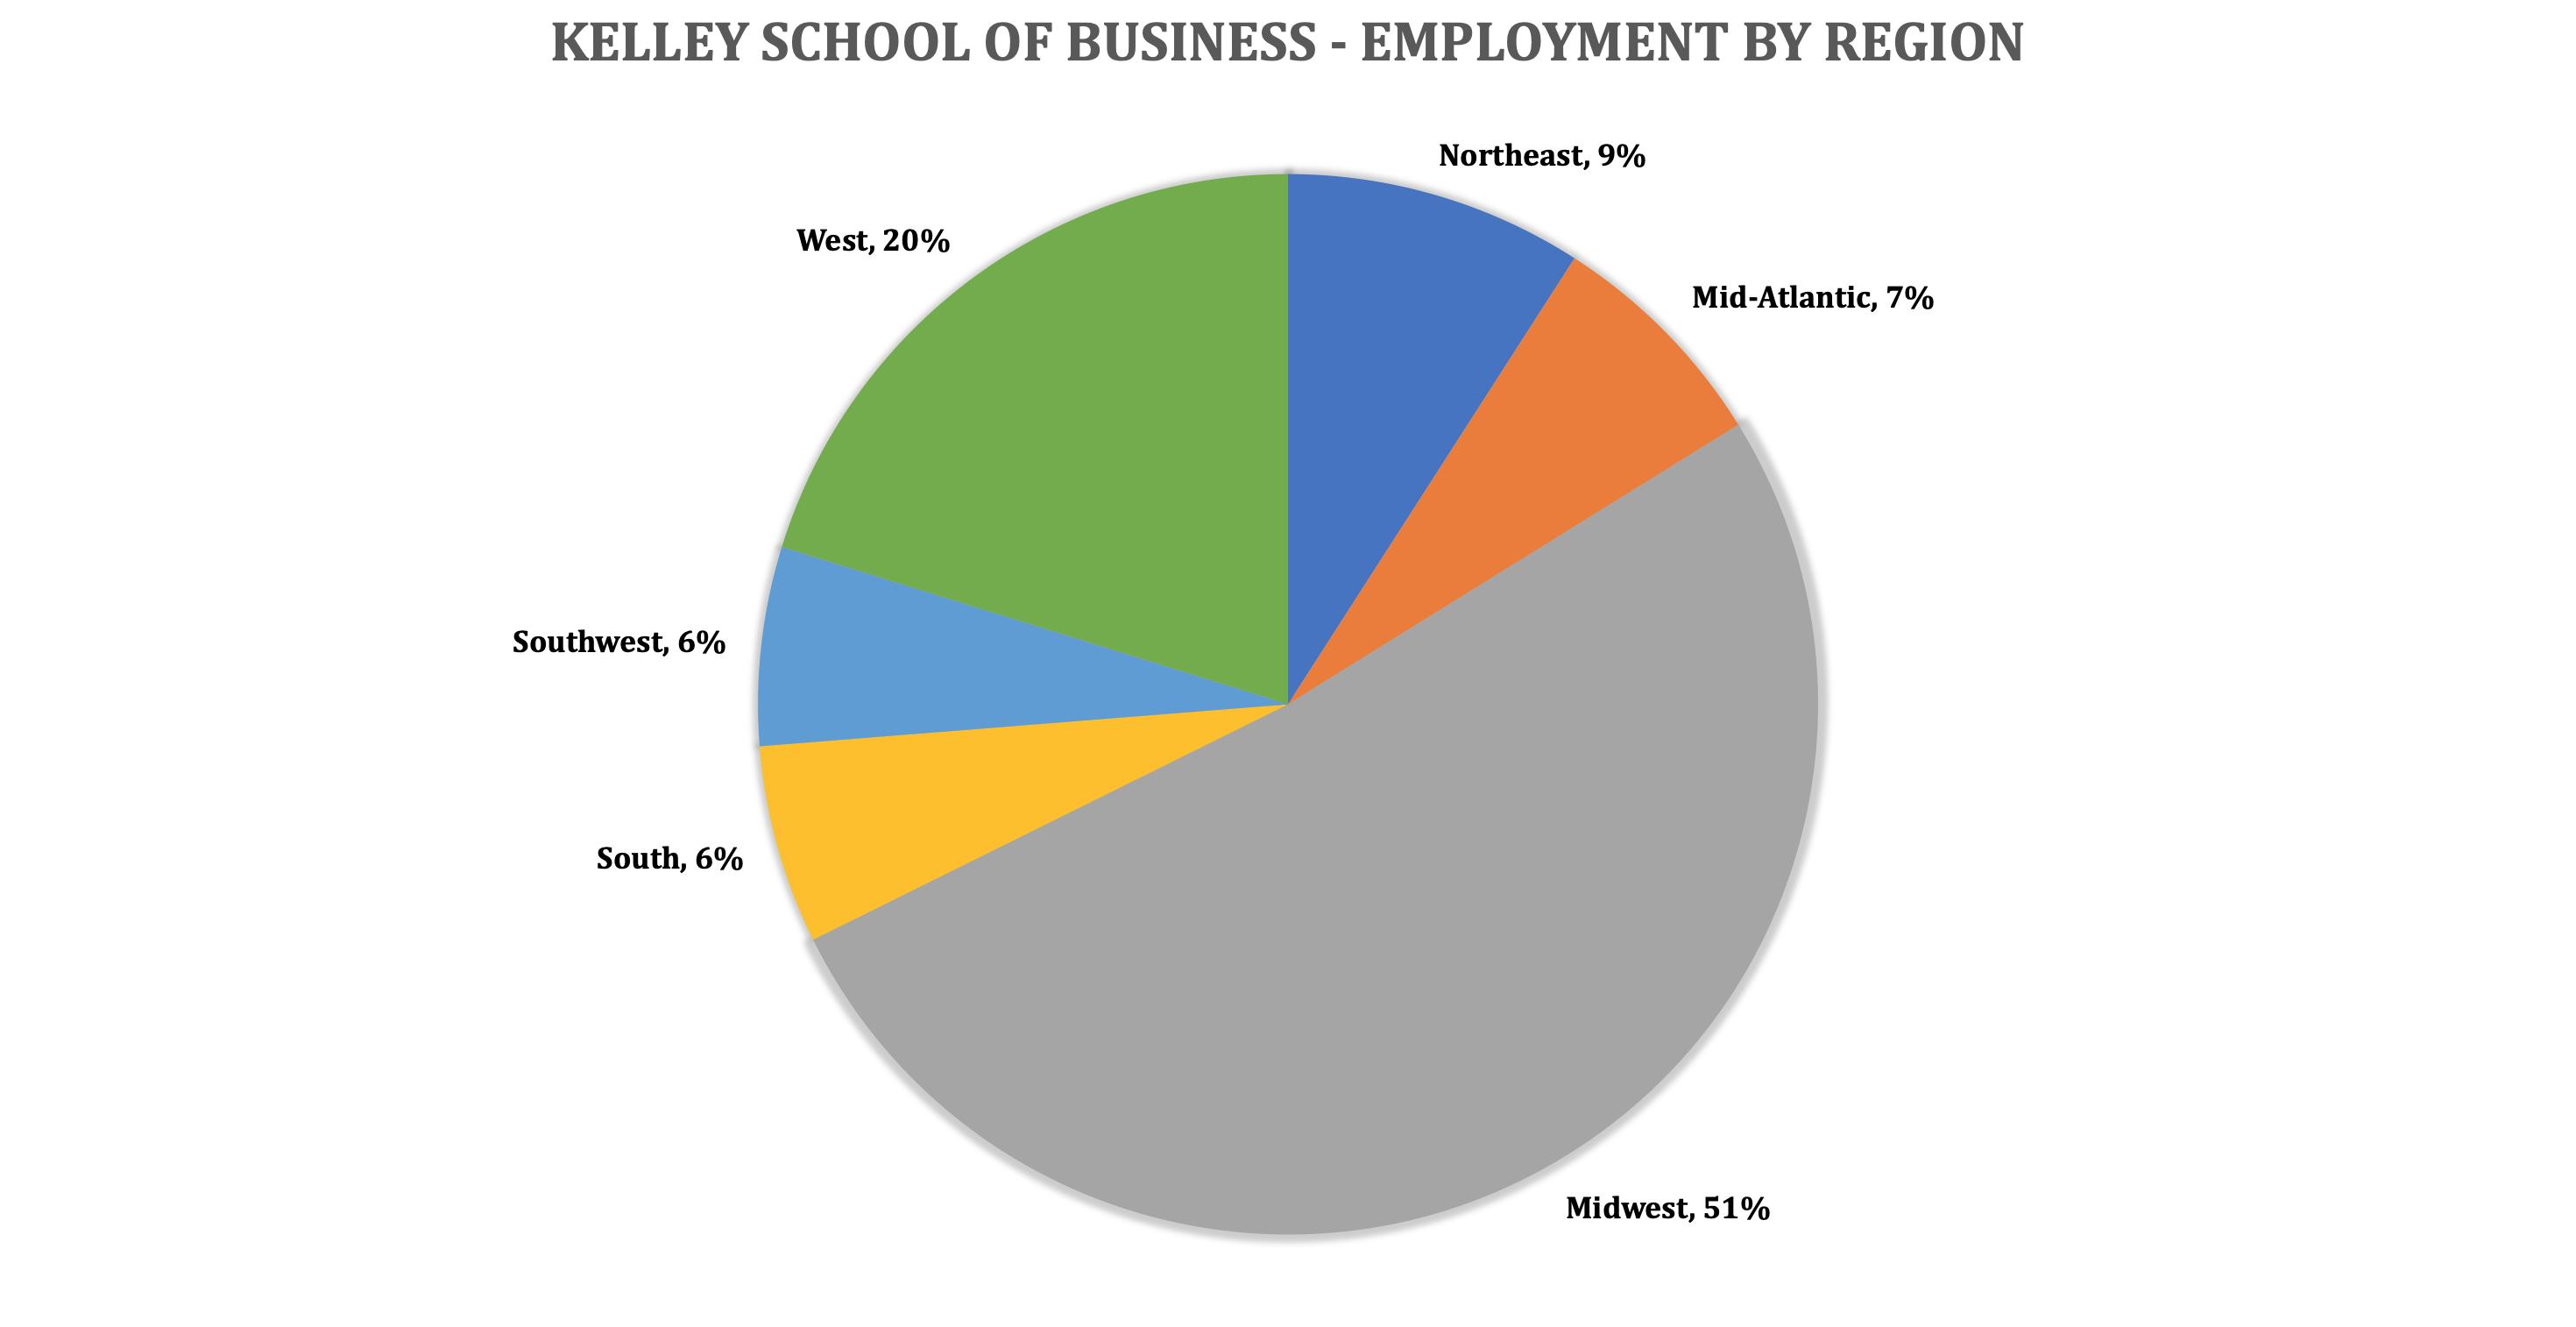 Indiana University Kelley School of Business - Kelley MBA Program - Employment by Region